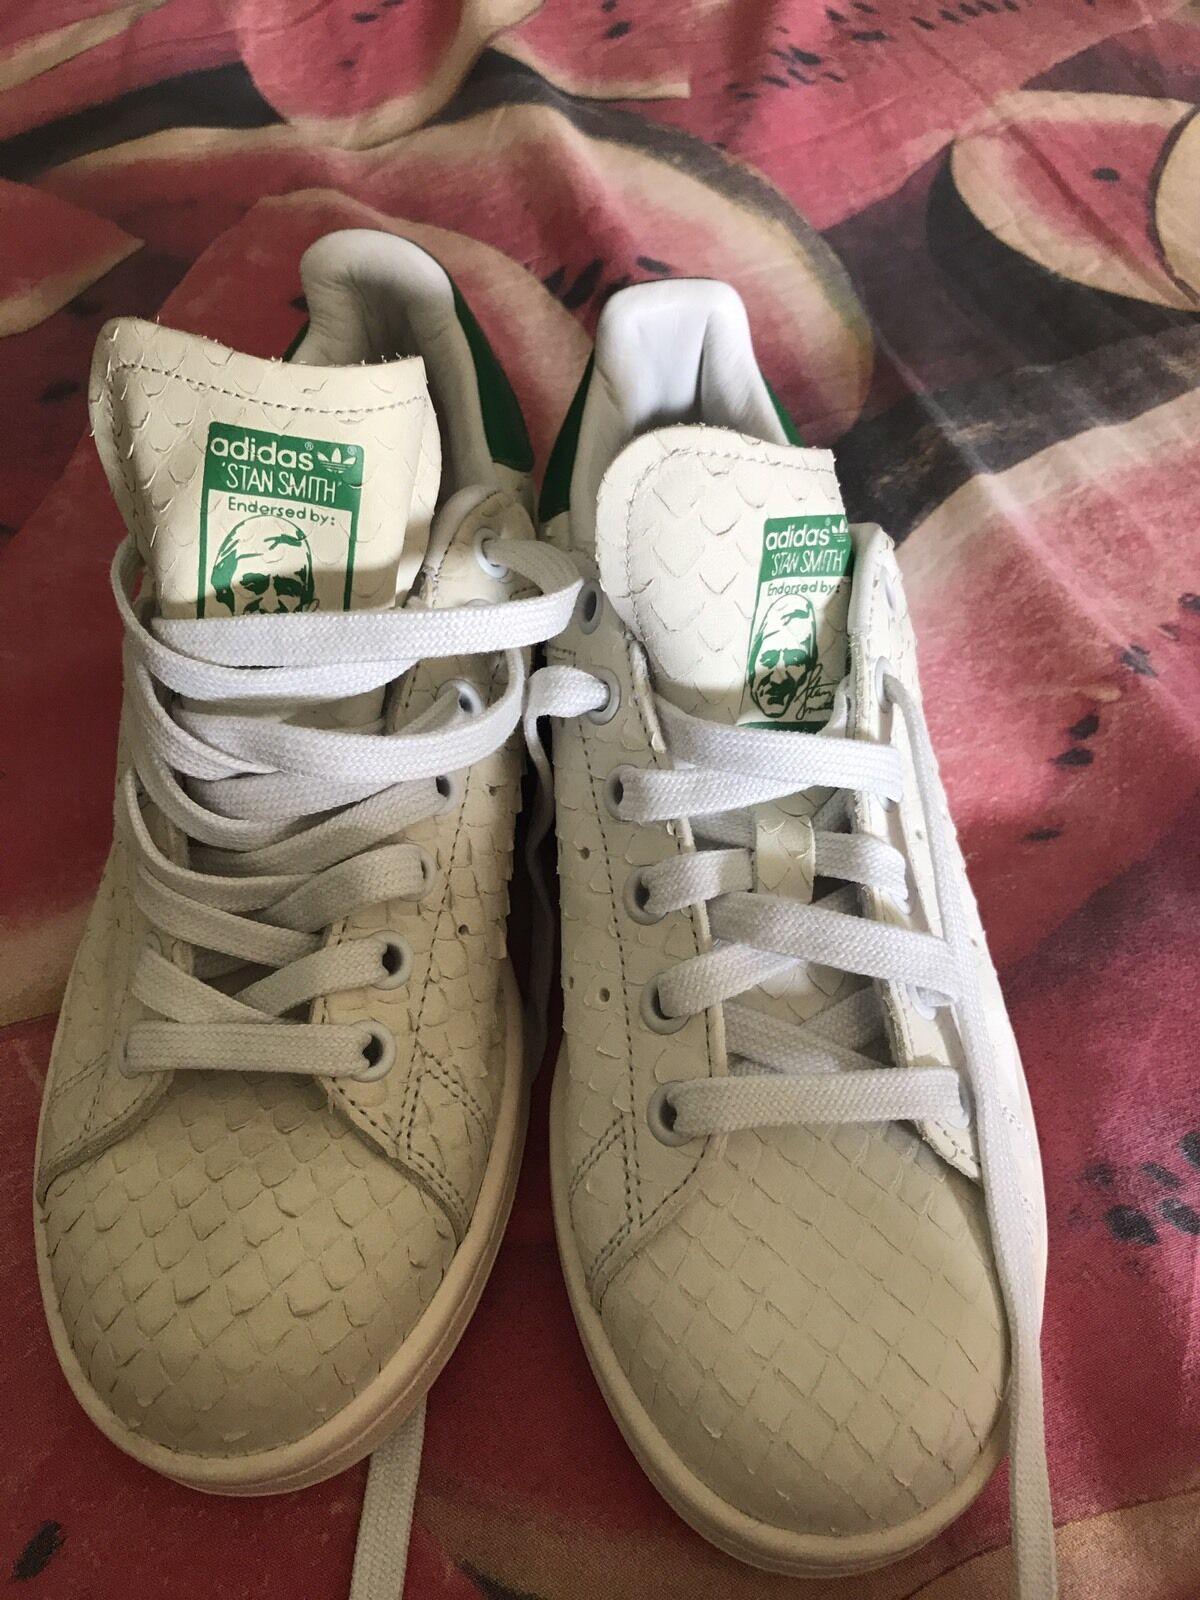 Adidas Stan Smith Tg N 38 Brand discount